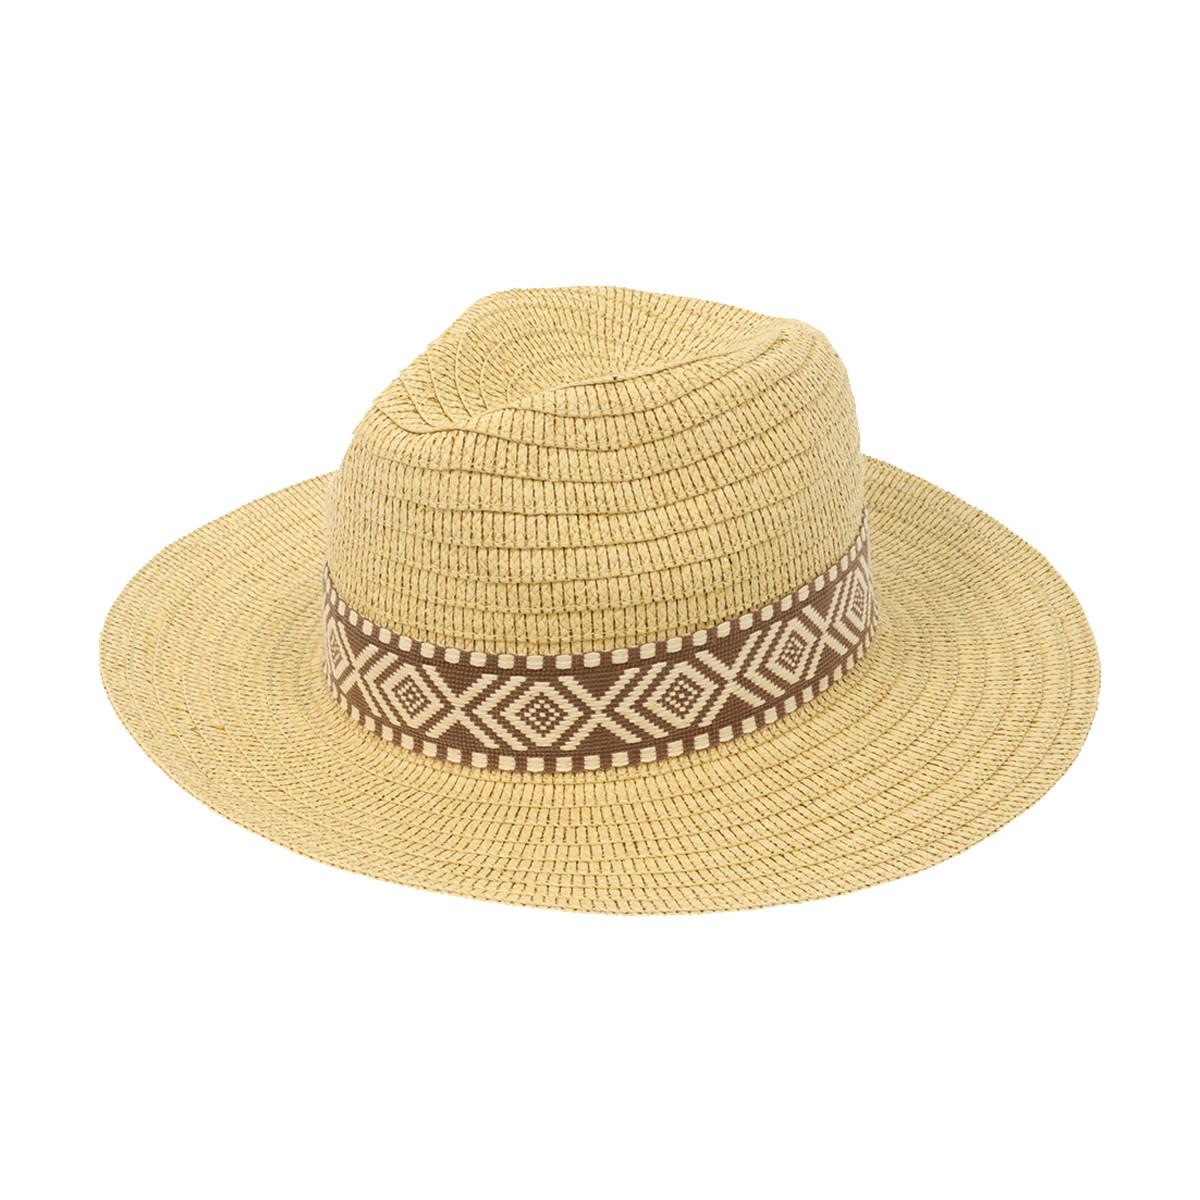 Joy Susan Joy Susan Natural Panama Hat w/ Brown Woven Band